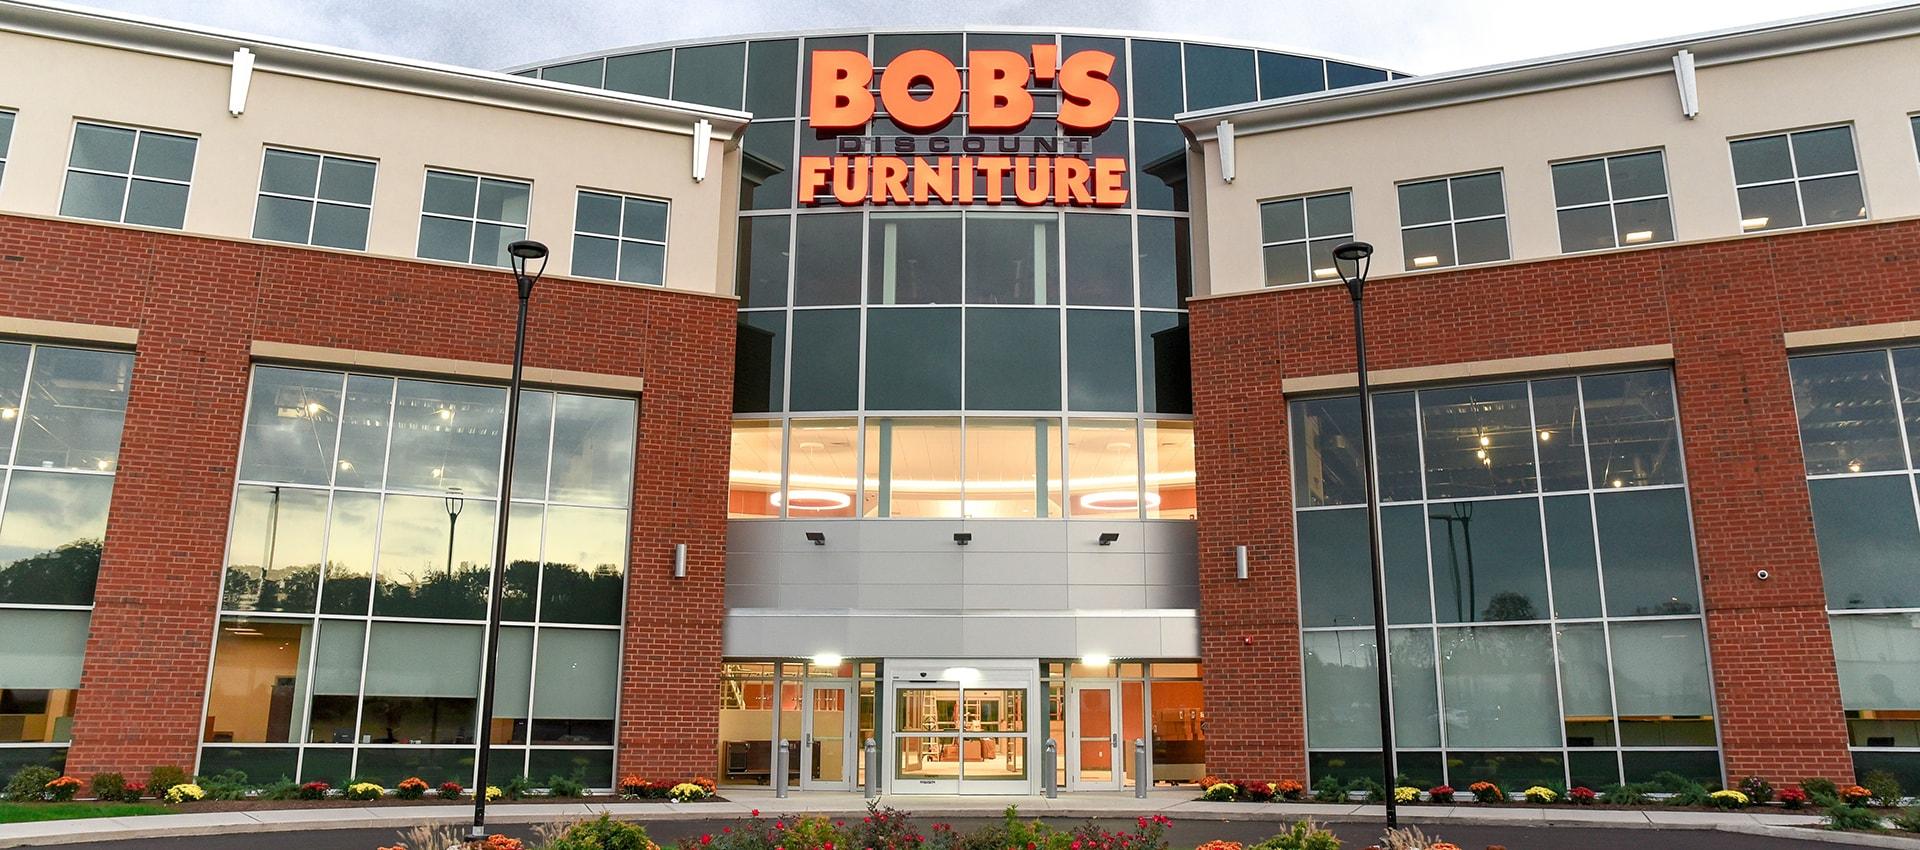 Bob S Discount Furniture Headquarters Waterstone Properties